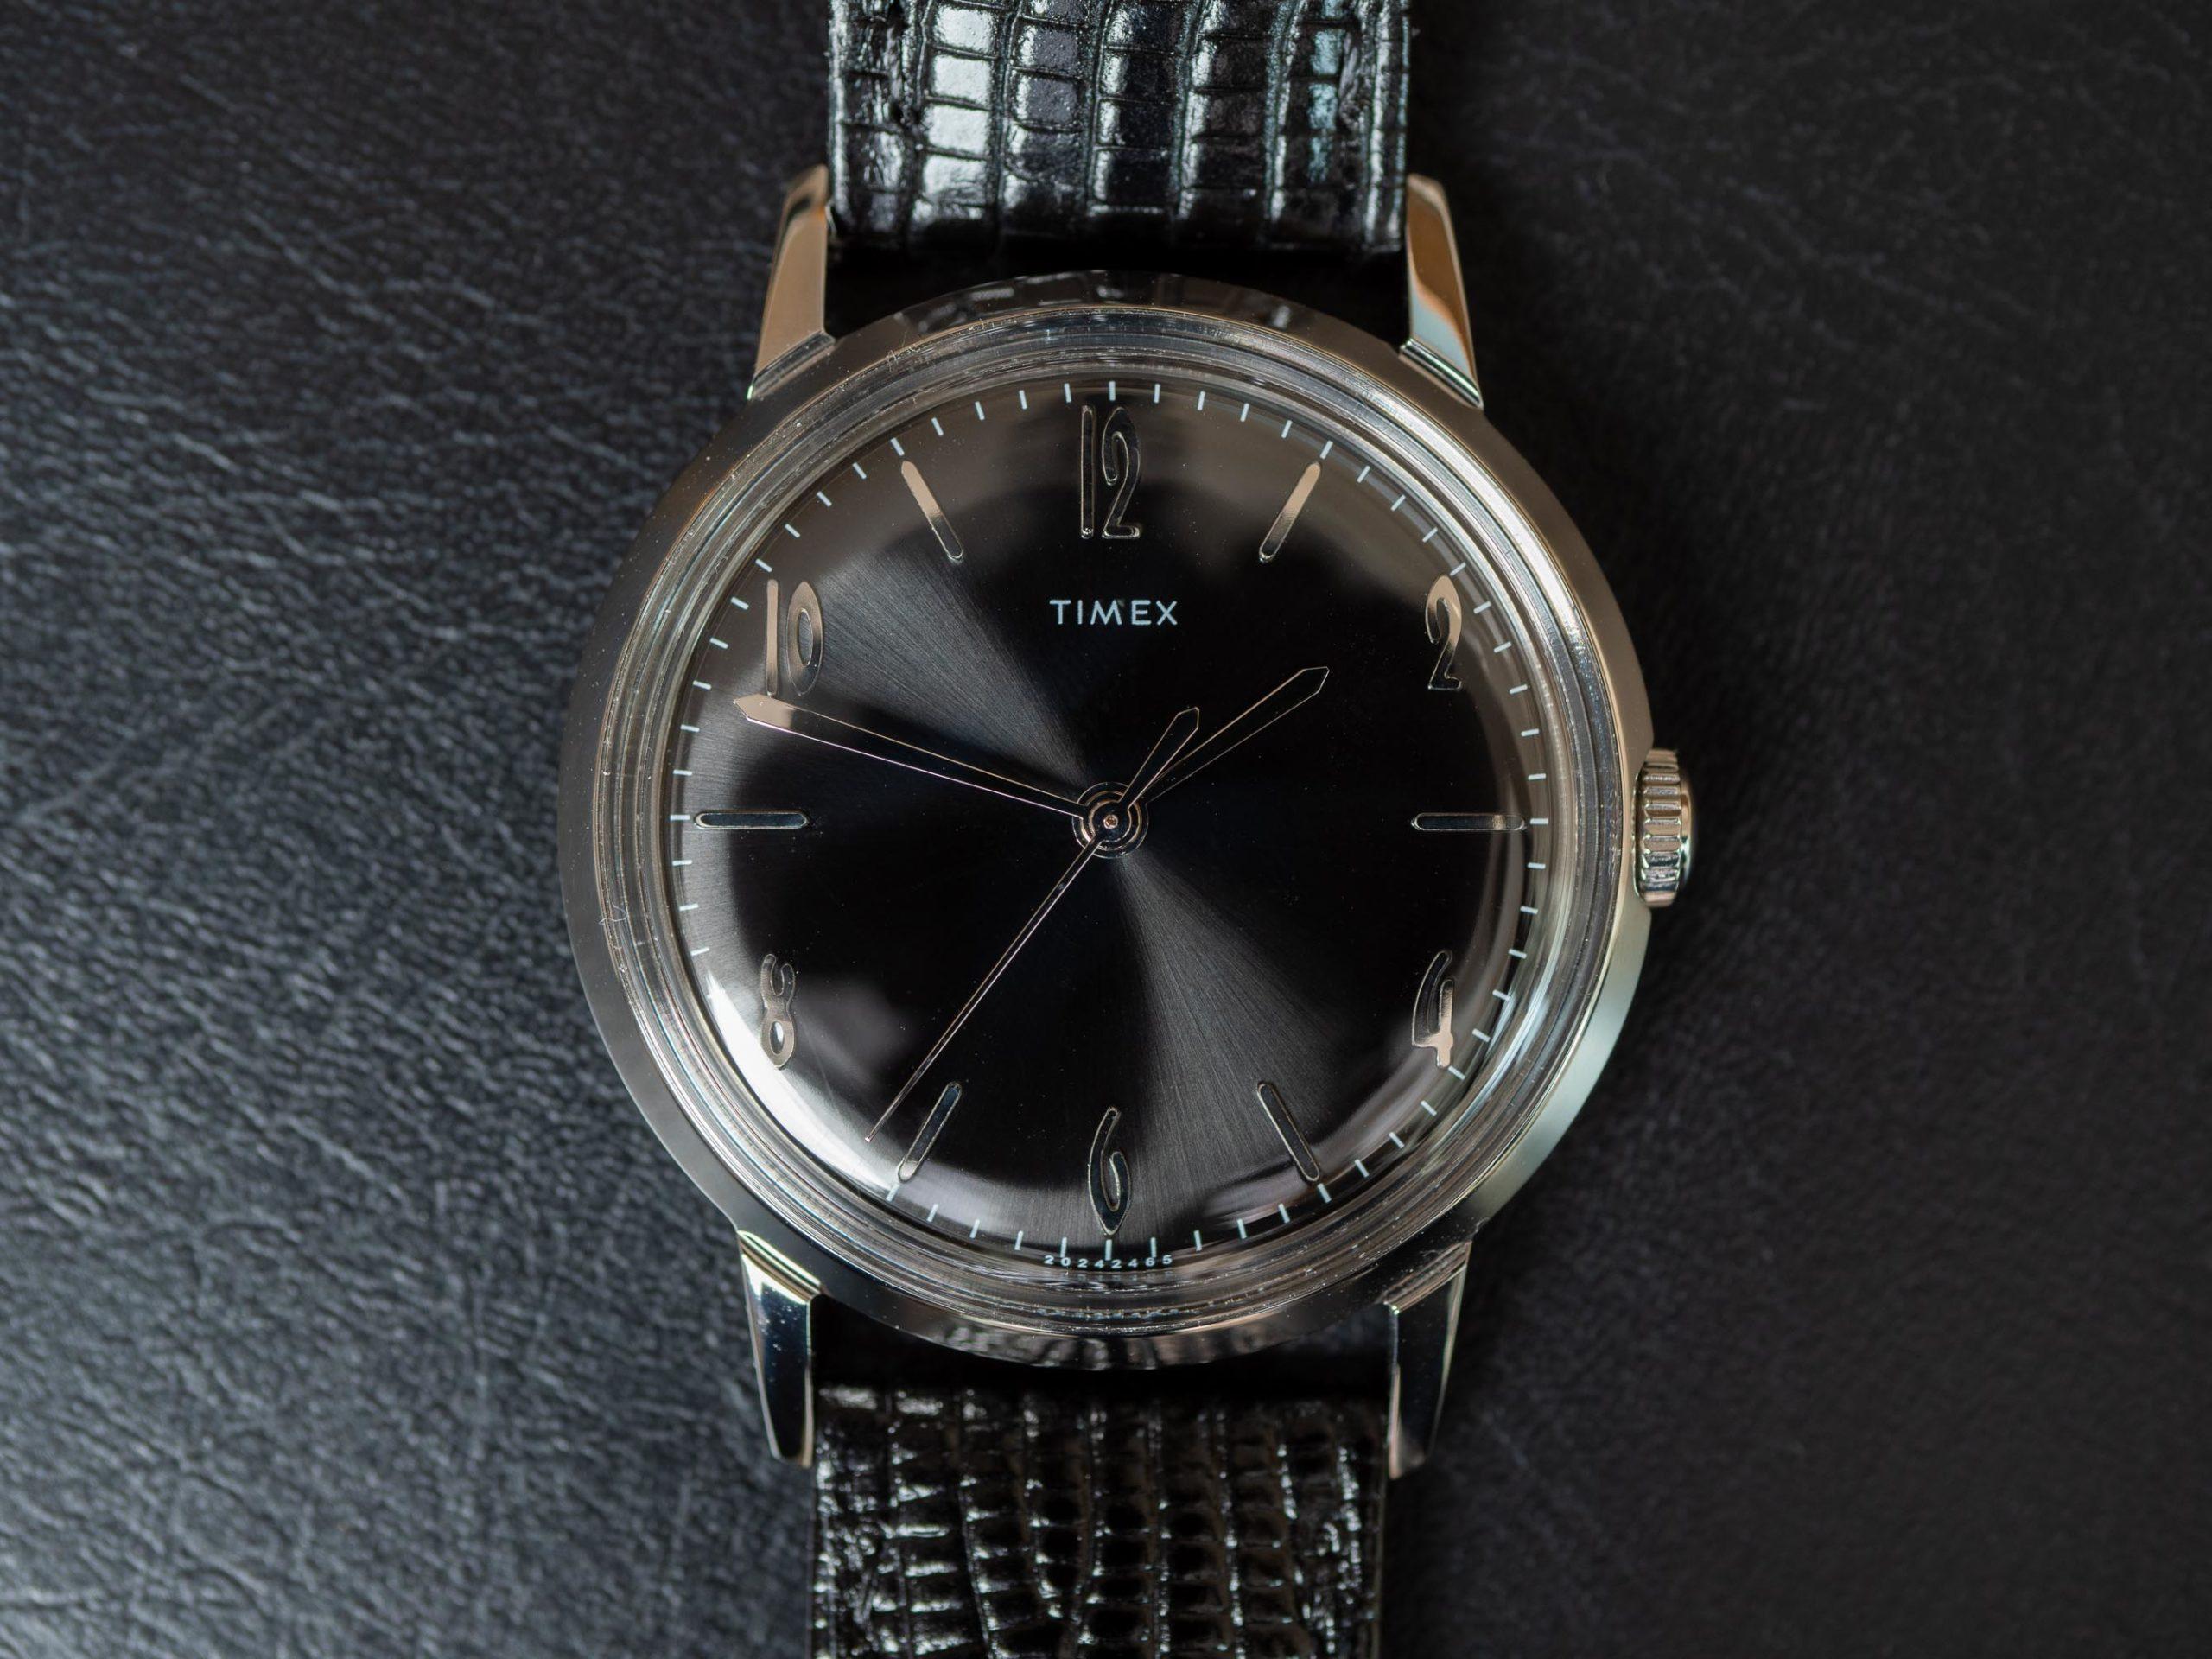 Timex Marlin 34 face